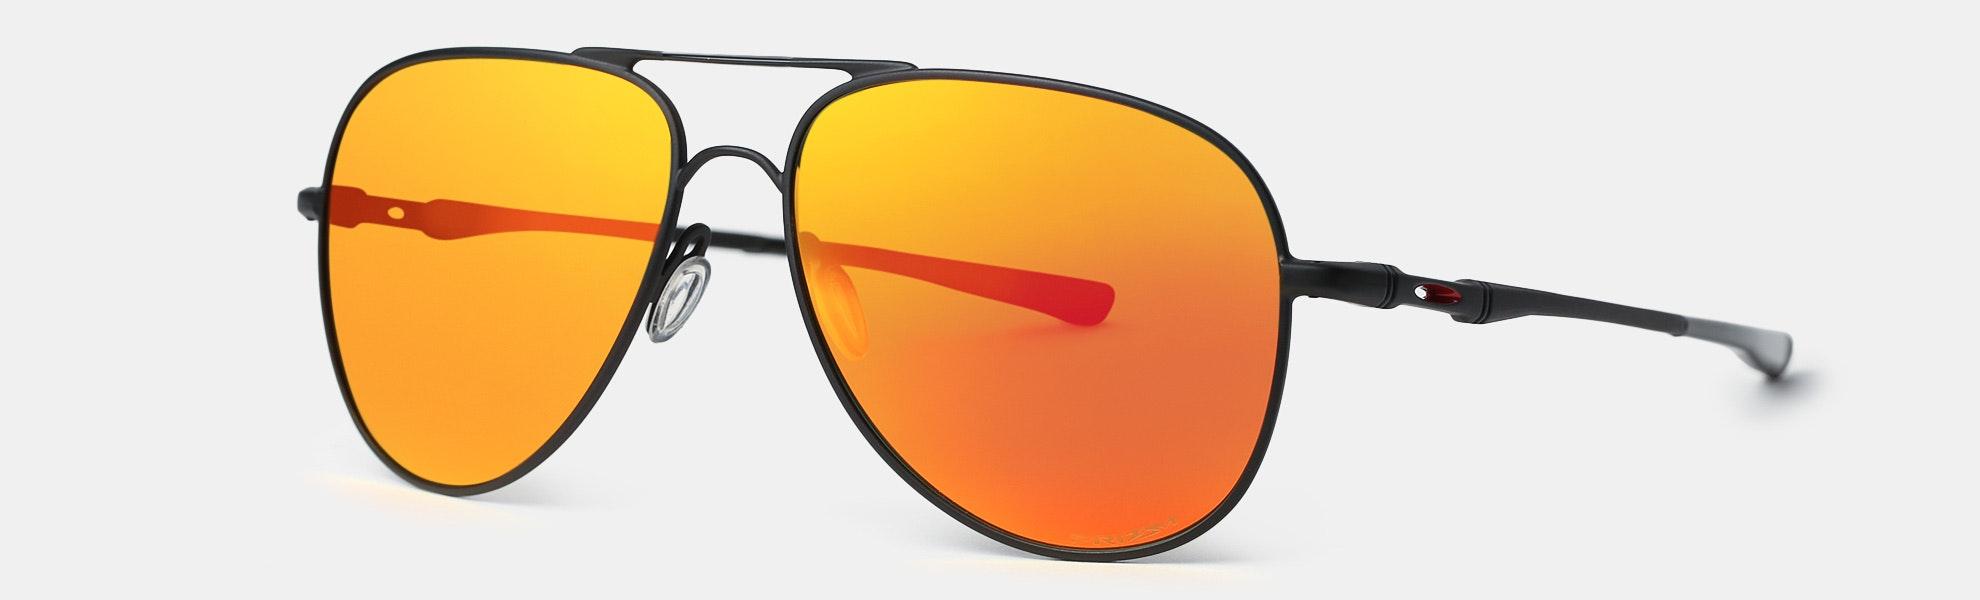 Oakley Elmont Aviator Sunglasses